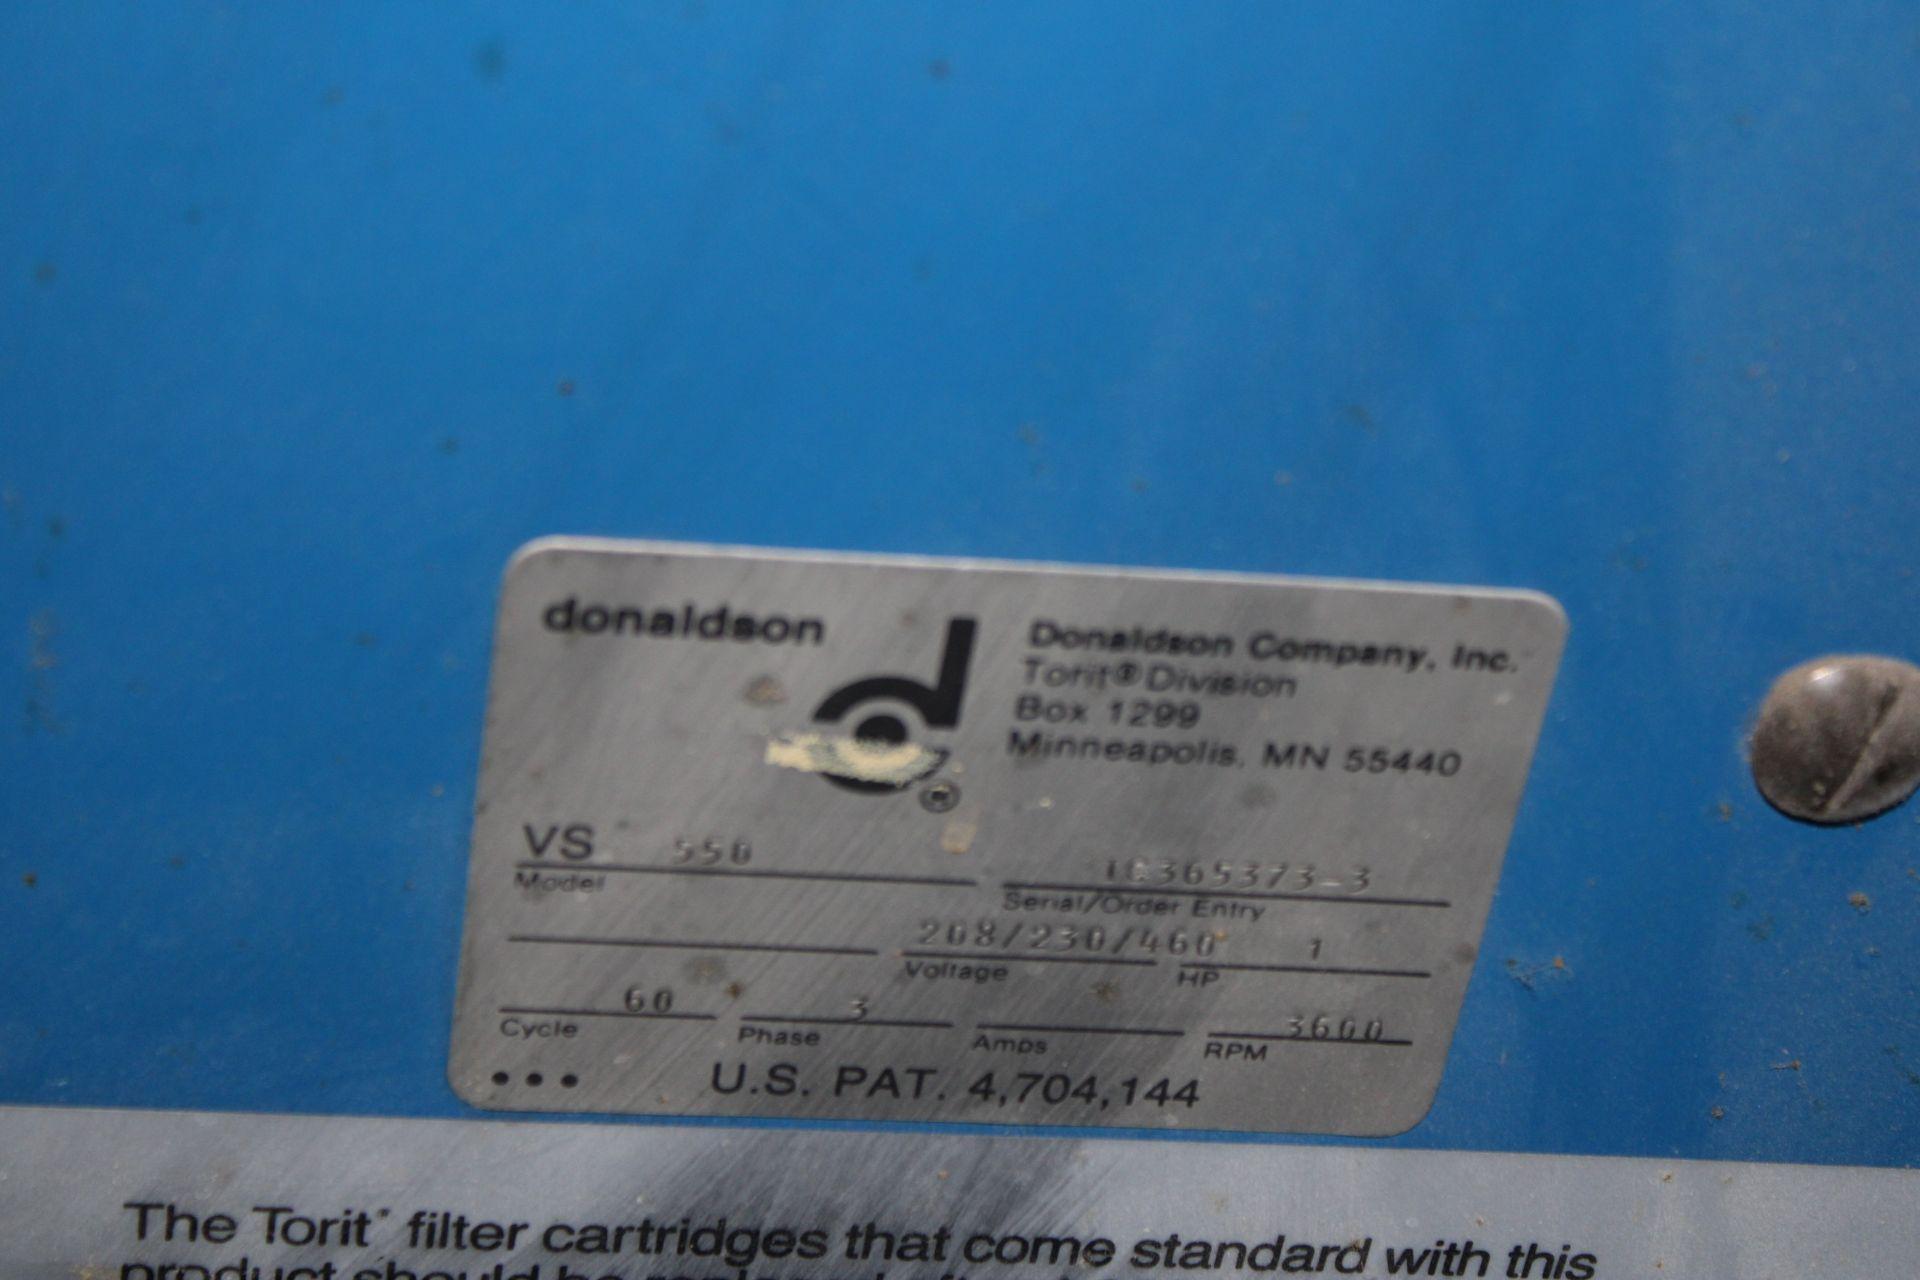 Lot 48 - Donaldson Torit Model VS550 Dust Collector s/n 1G365373-3